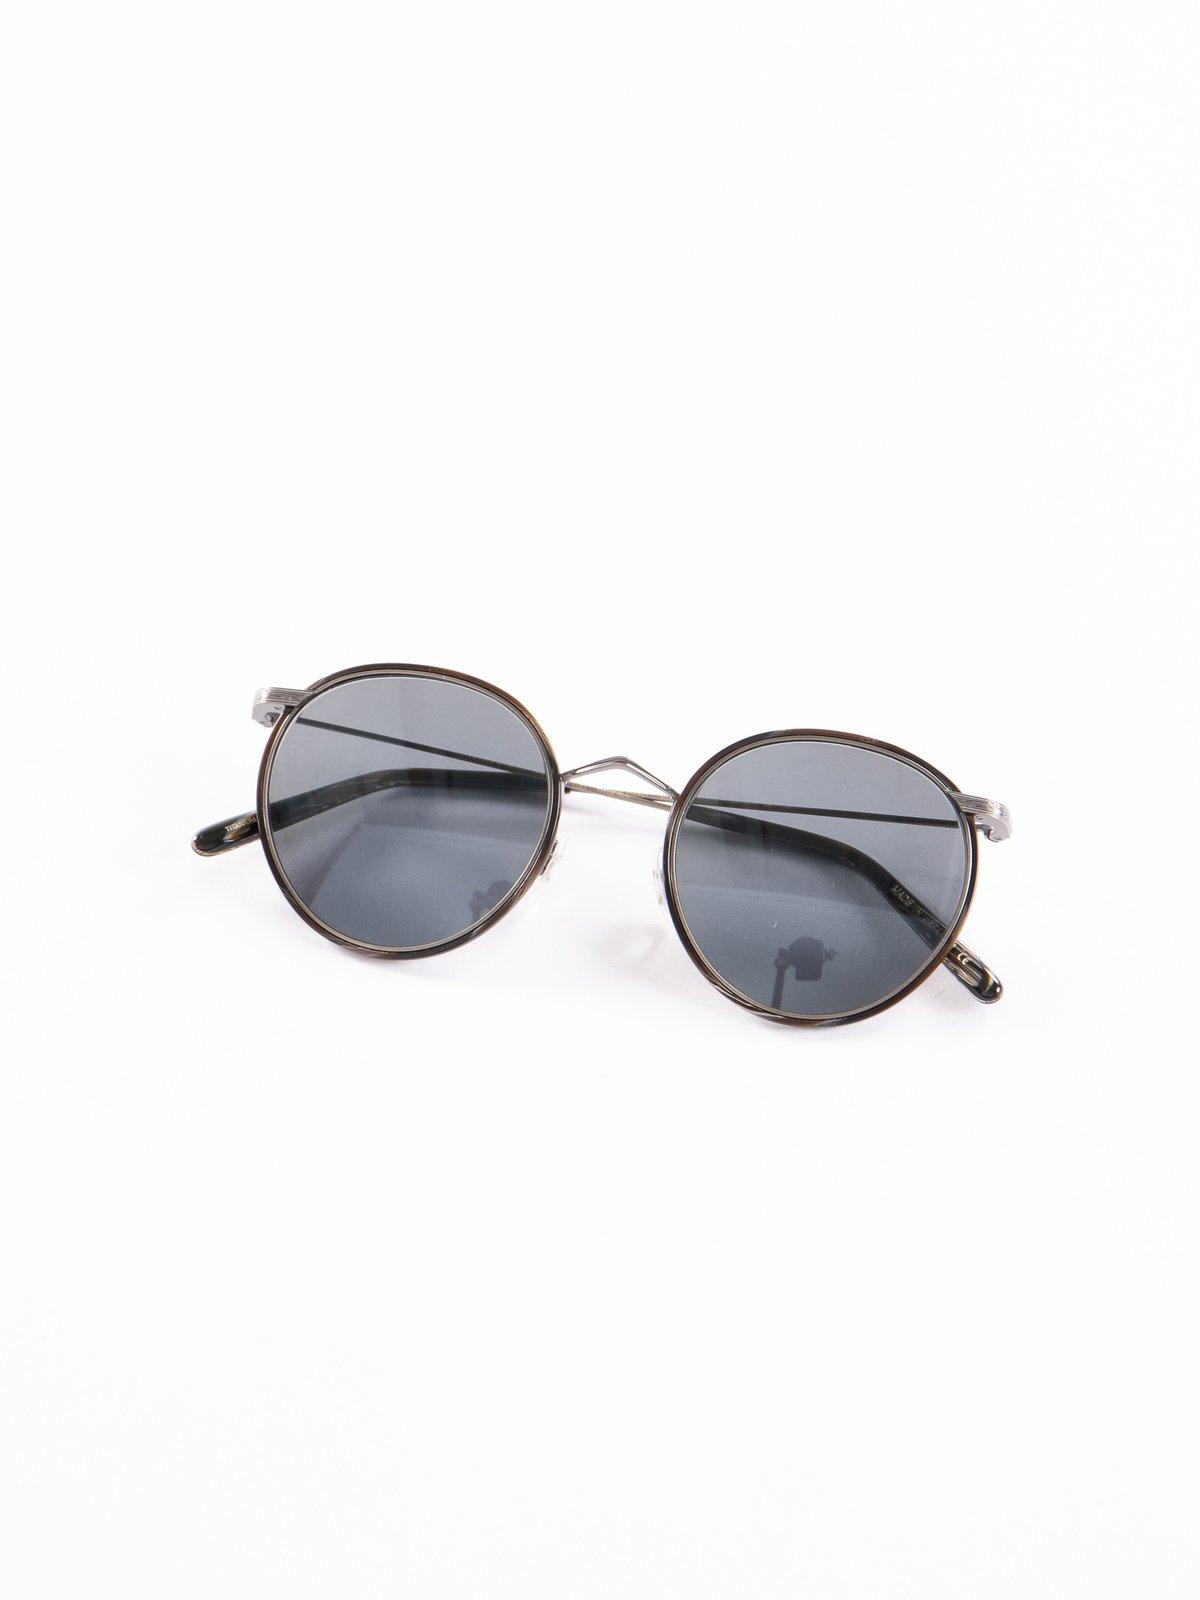 Pewter–Black Horn/Carbon Grey Casson Sunglasses - Image 1